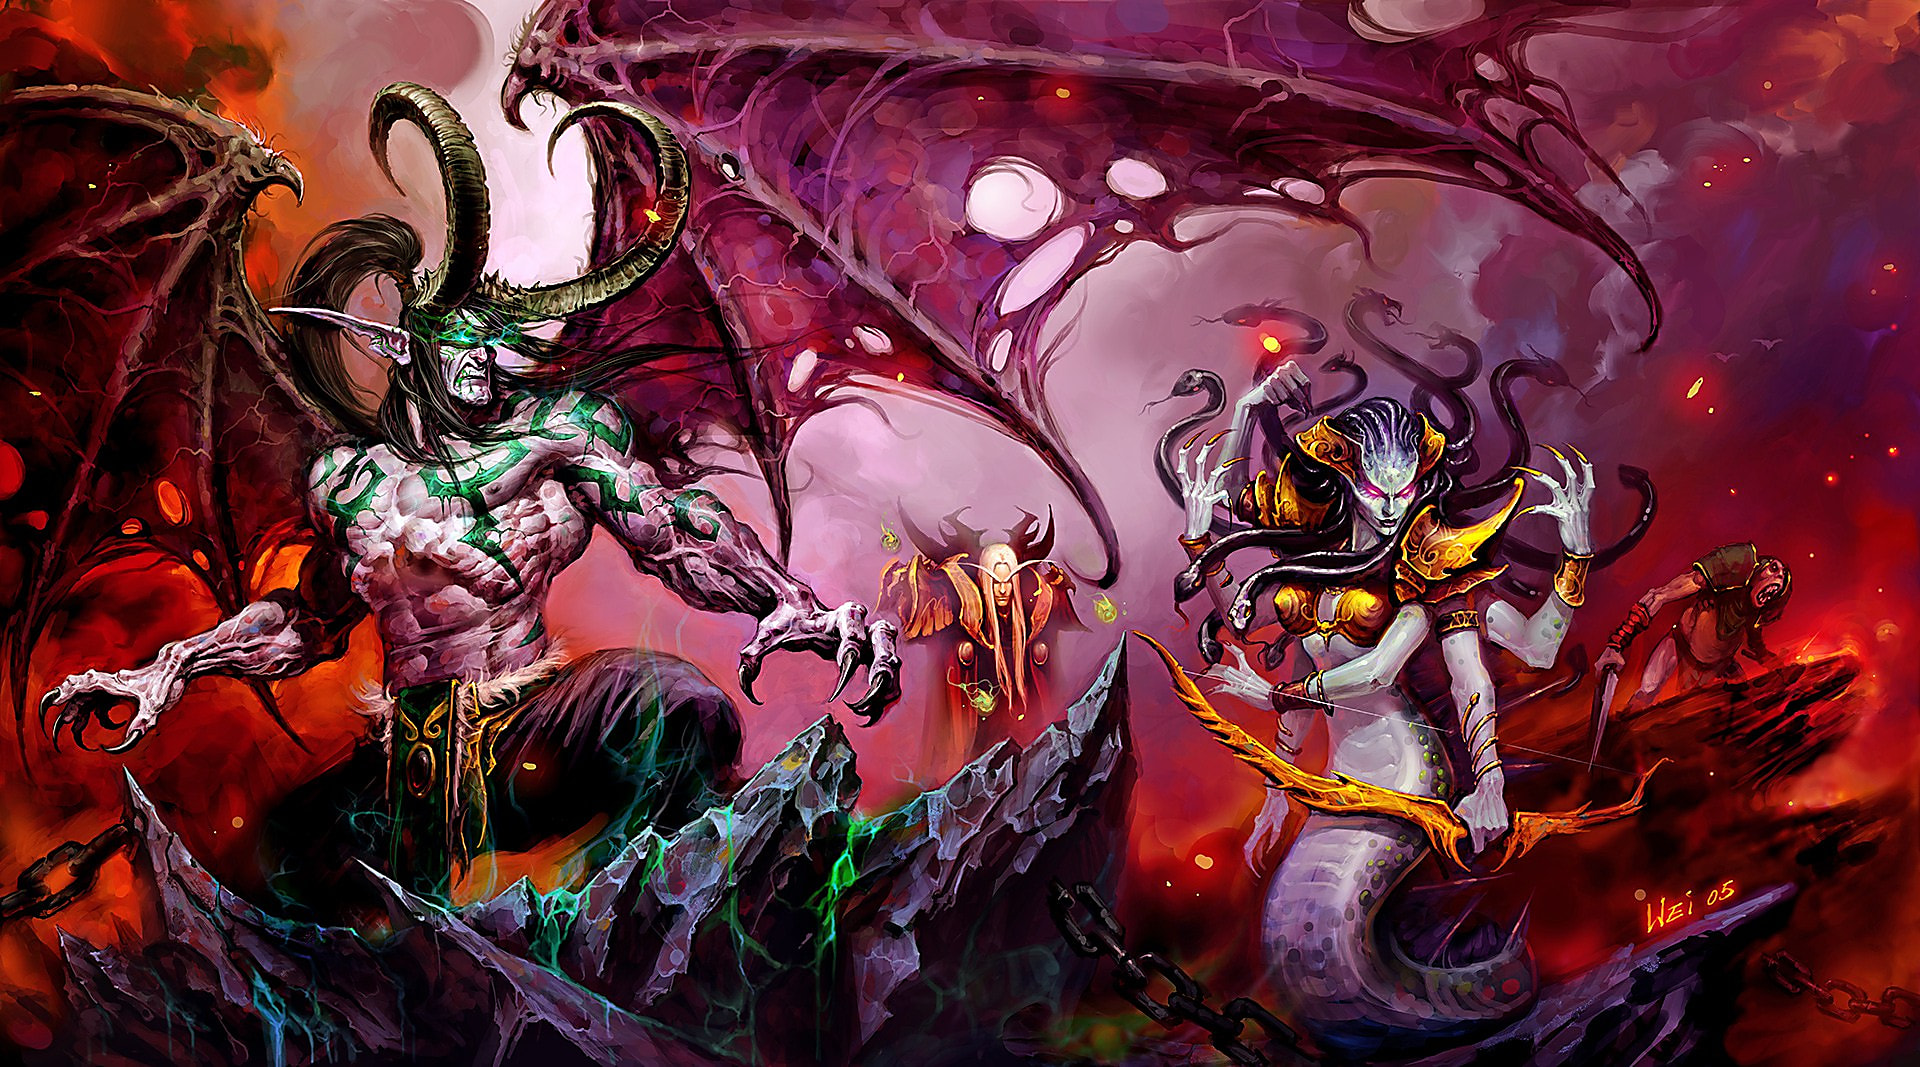 illidan-kaelthas-world-of-warcraft.jpg